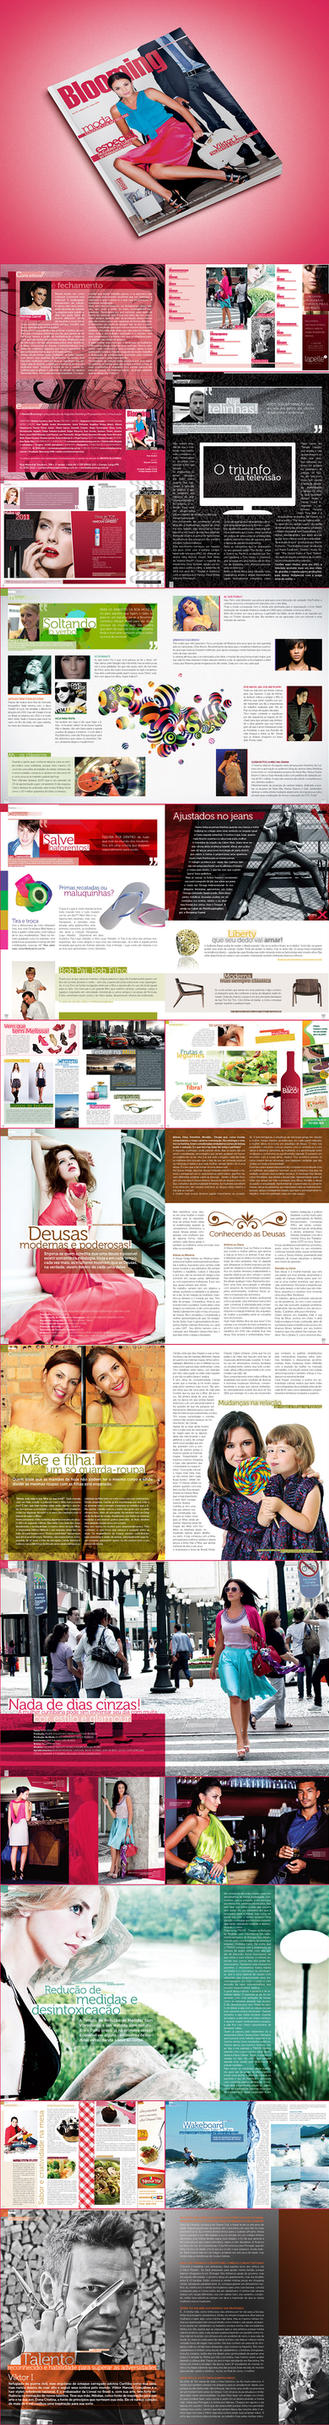 blooming magazine 8 by felipeart